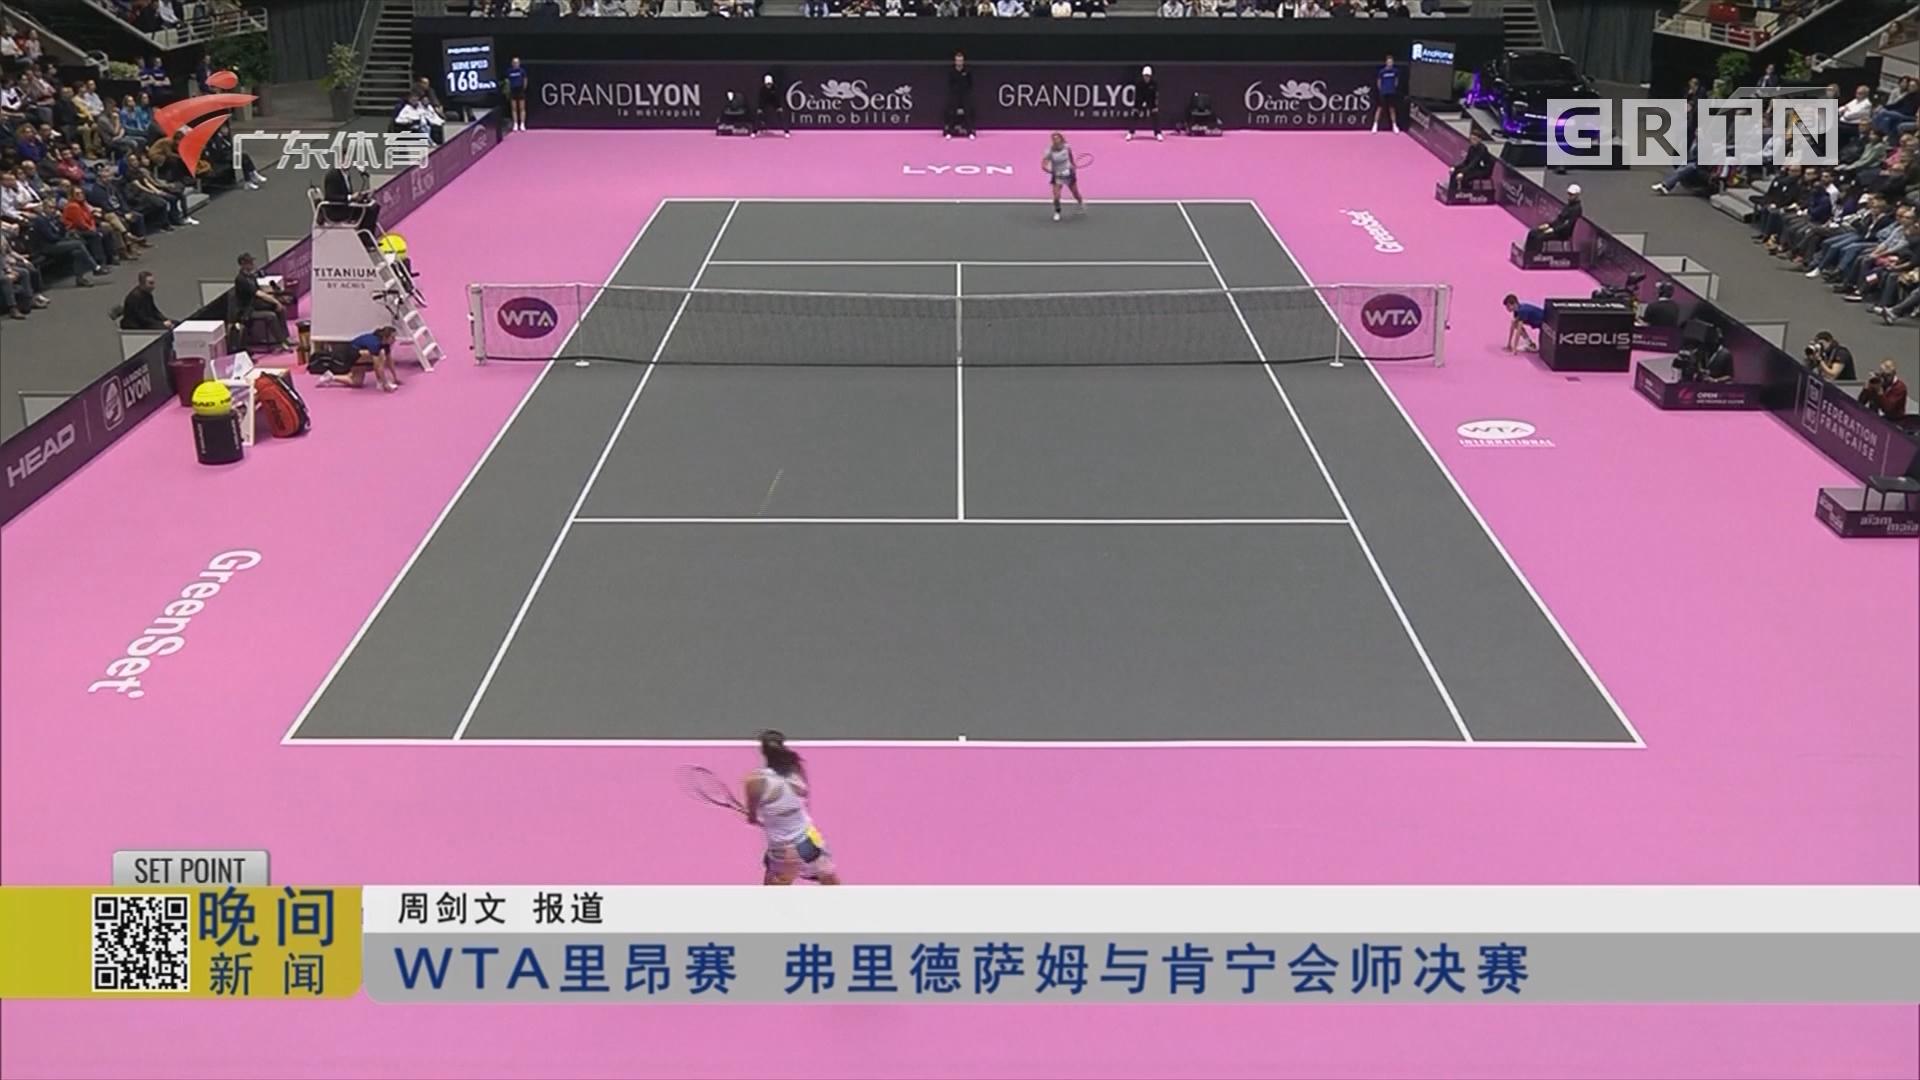 WTA里昂赛 弗里德萨姆与肯宁会师决赛